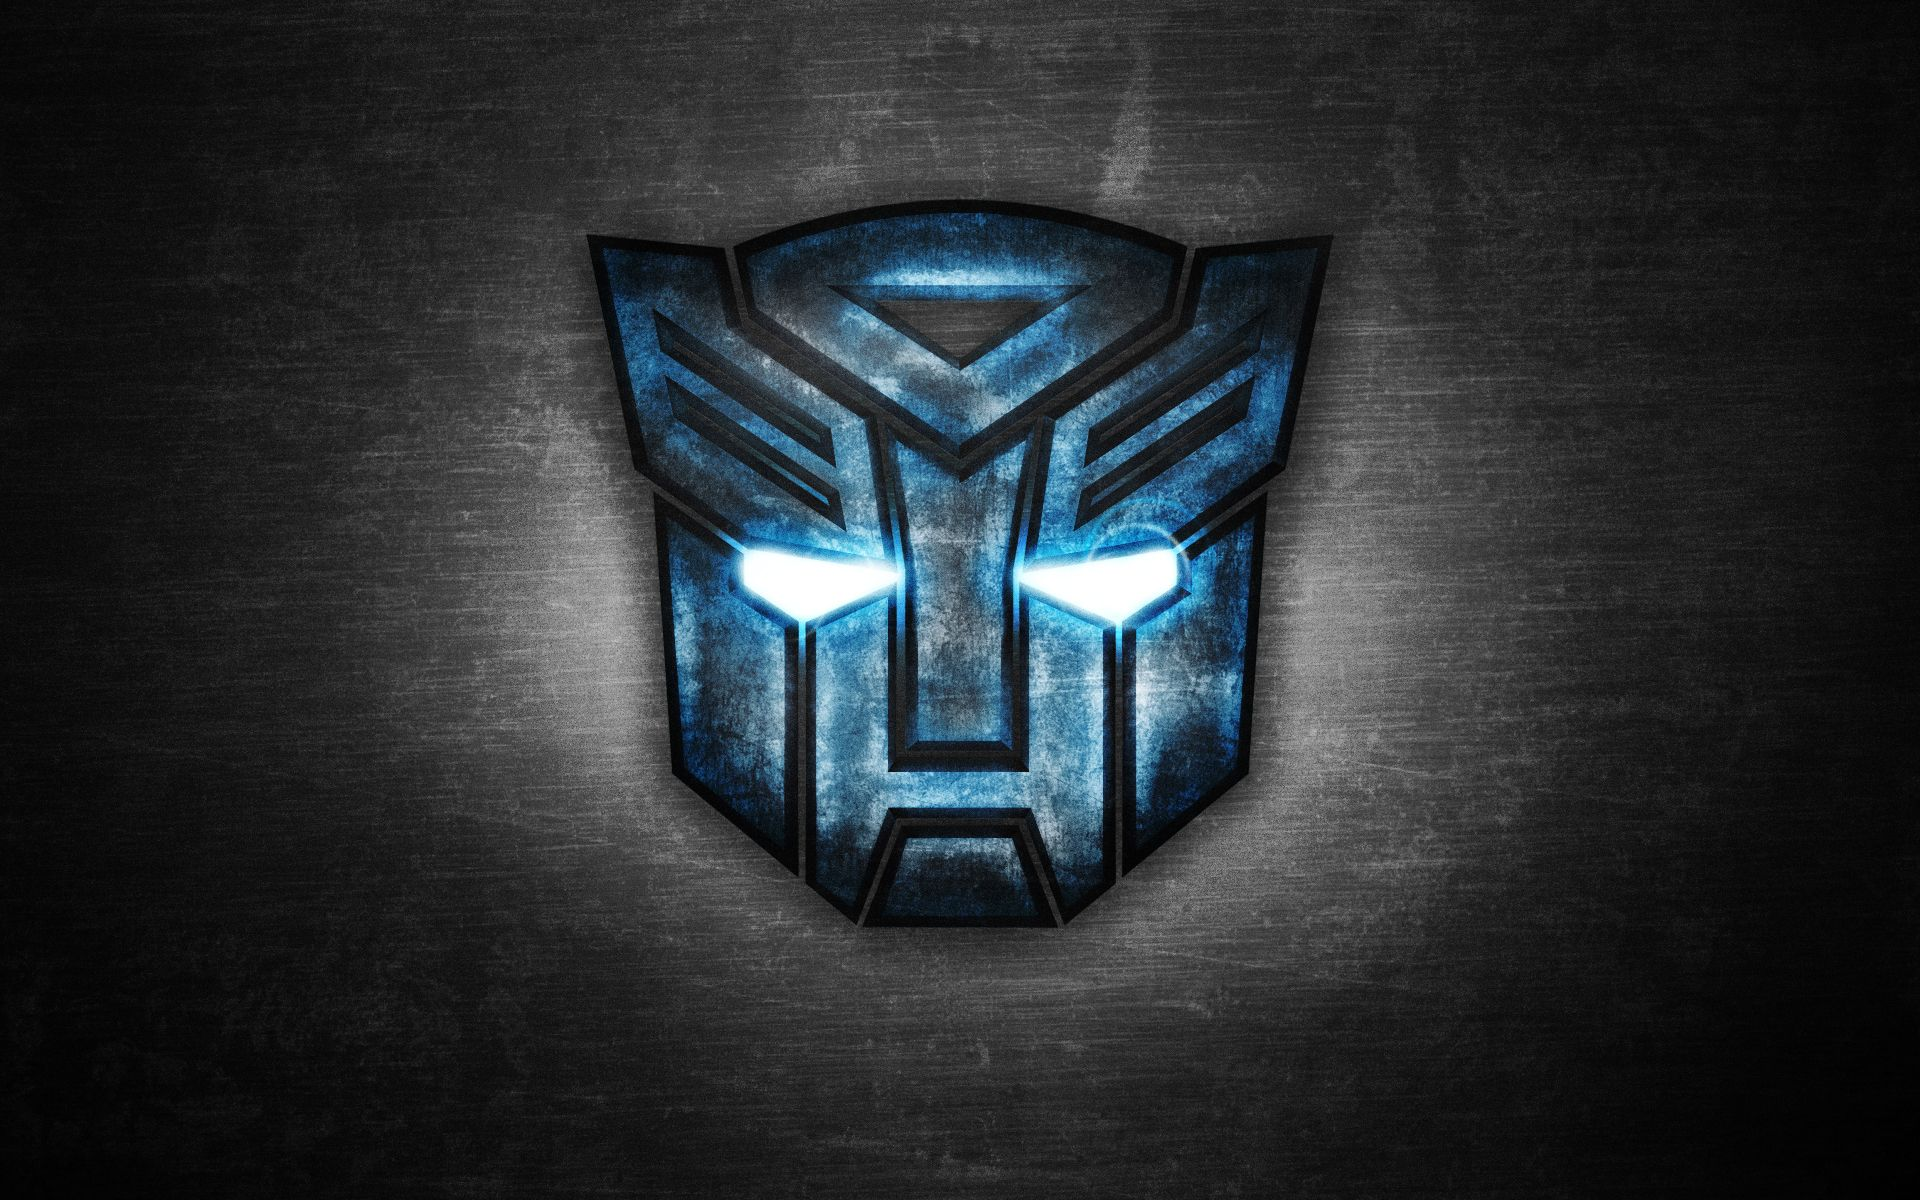 Transformers Logo Google Search Transformer Logo Transformers Autobots Logo Wallpaper Hd